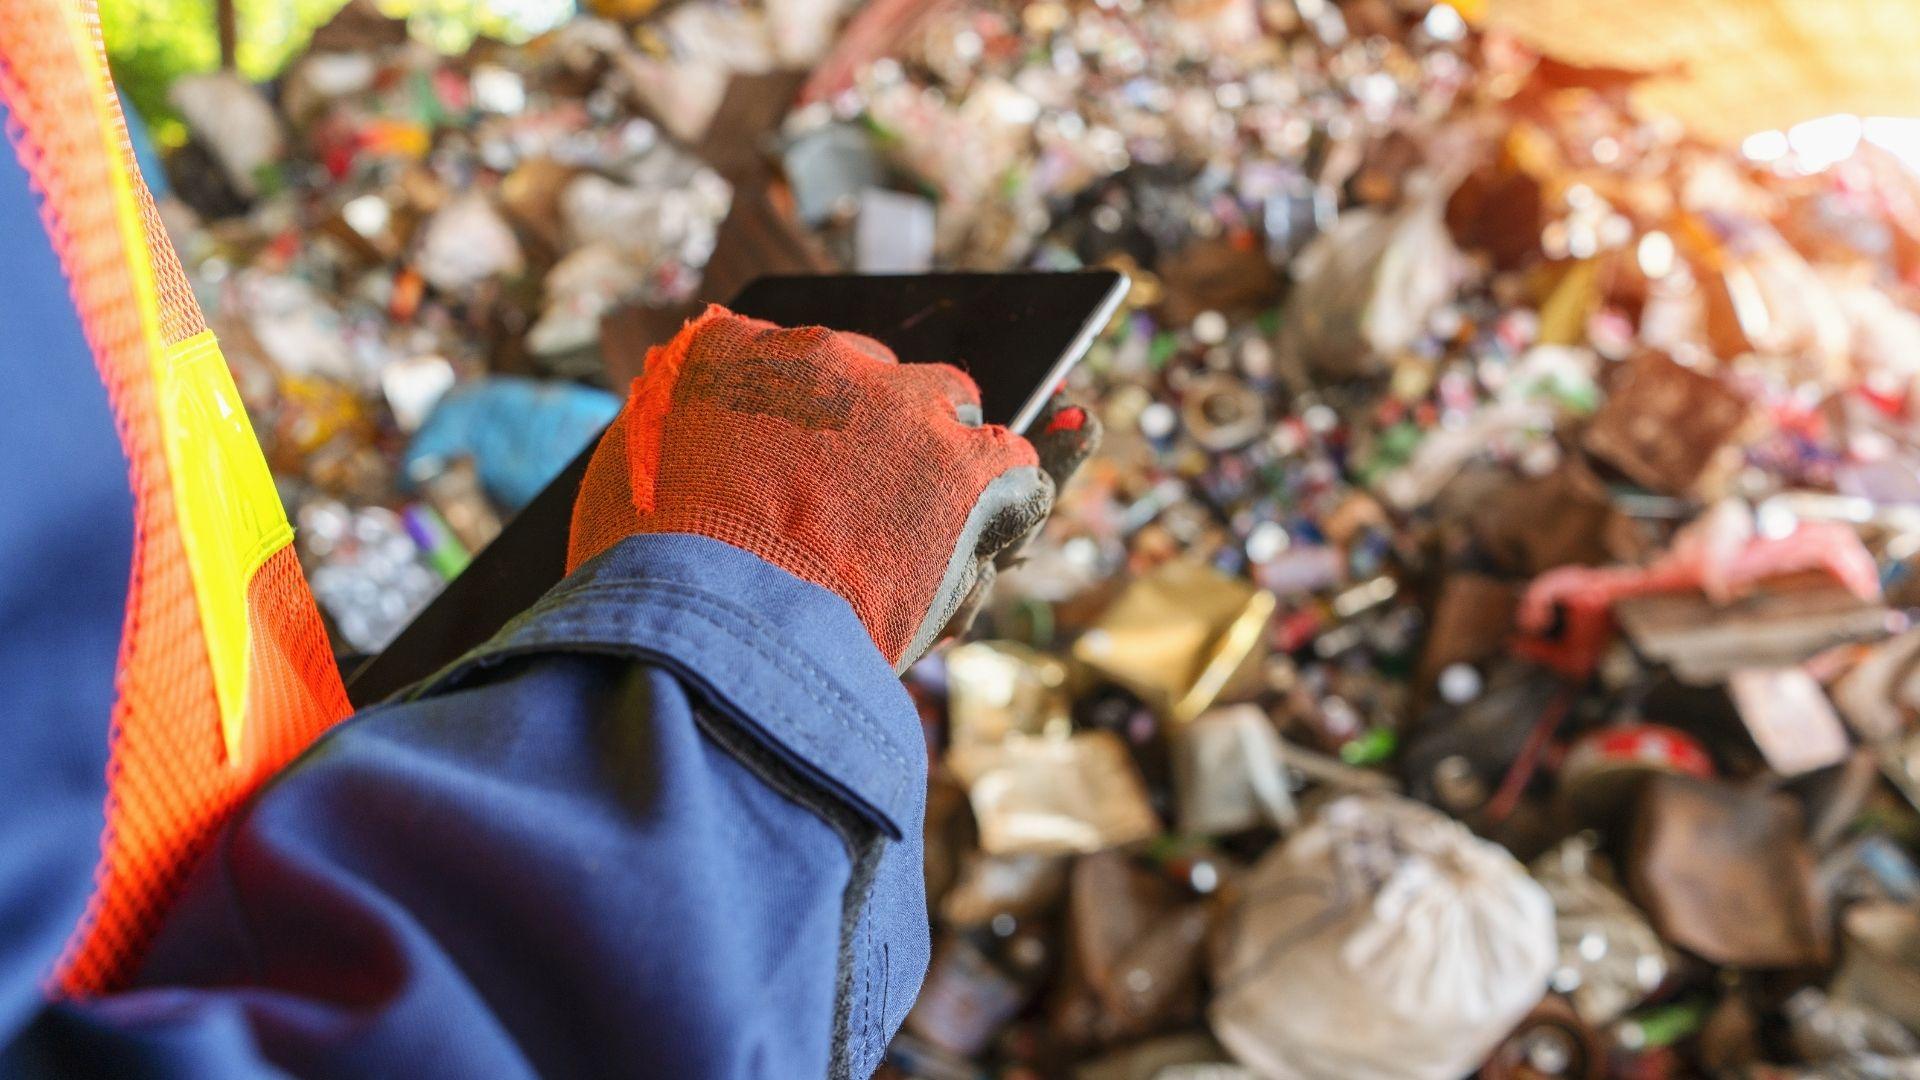 E - Waster Recycling process